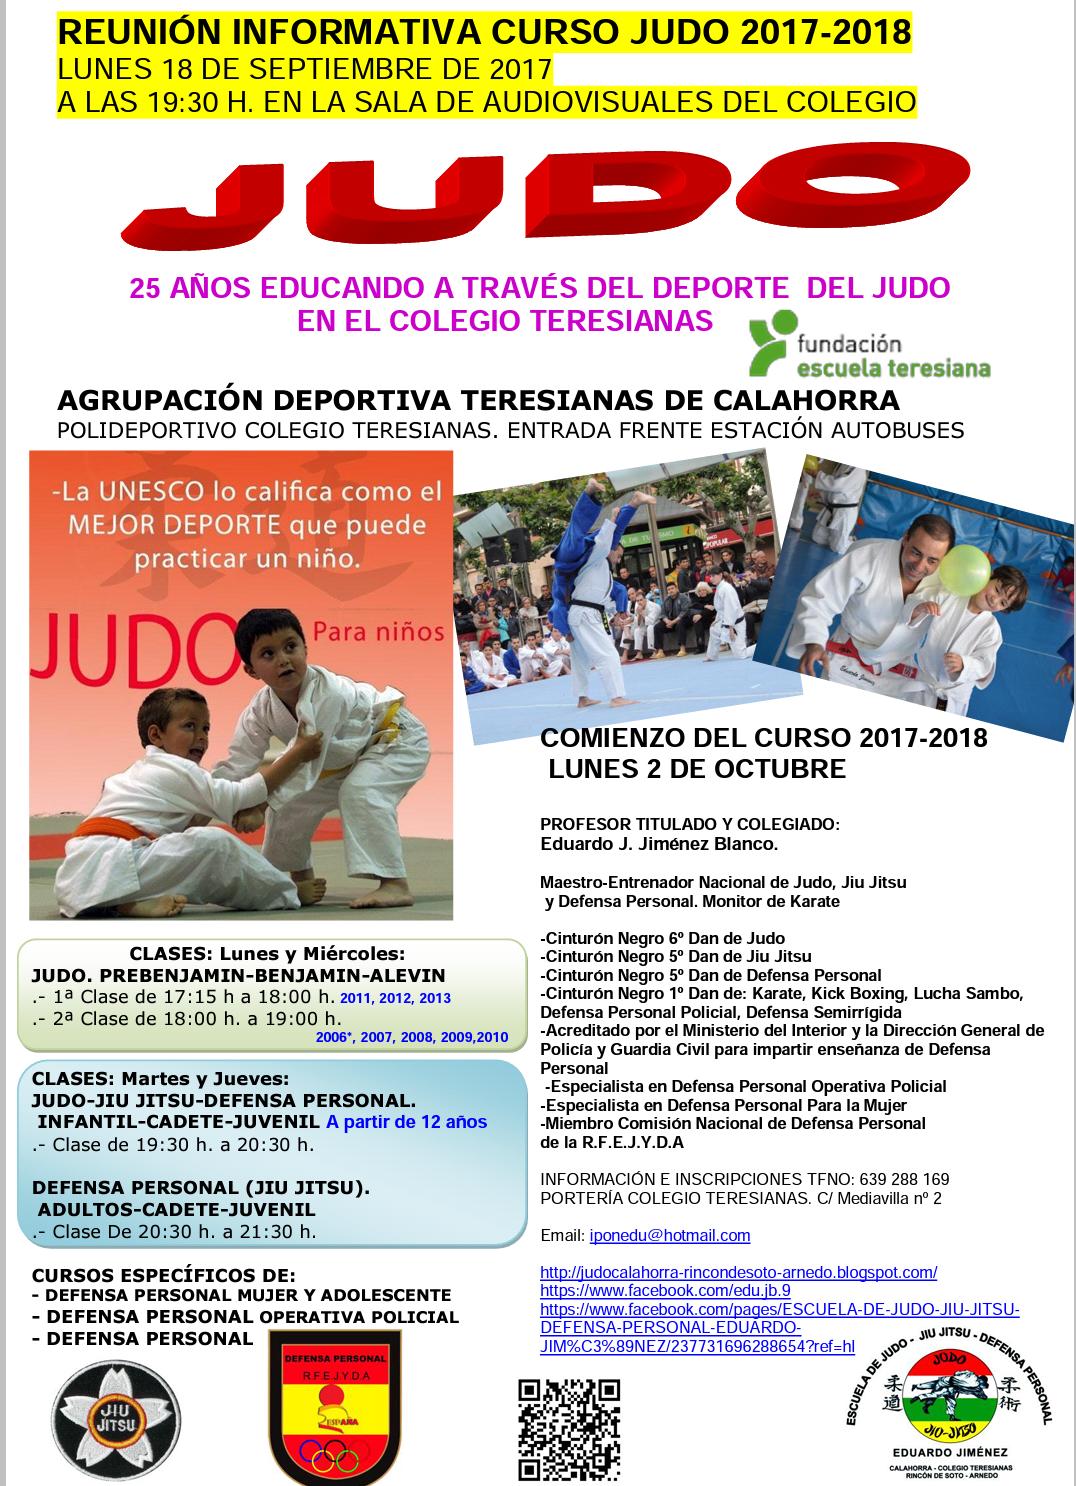 Reunión informativa Judo curso 2017-2018